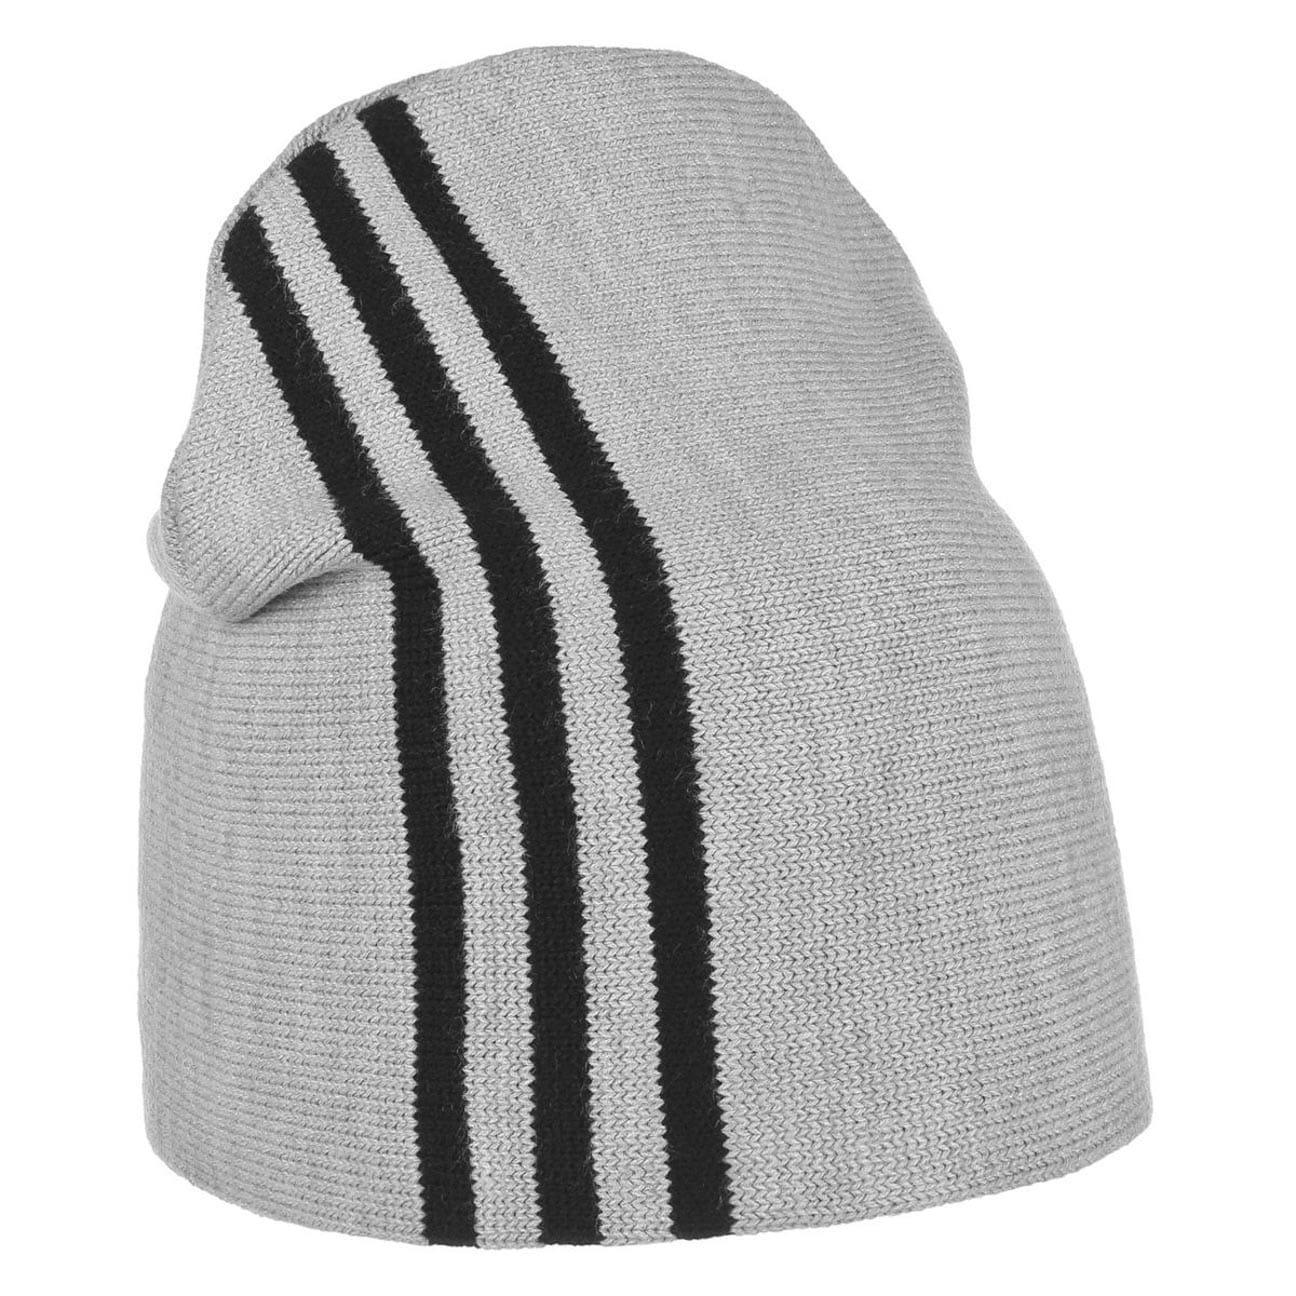 Ess 3 Stripes Beanie 3 By Adidas Eur 9 95 Gt Hats Caps